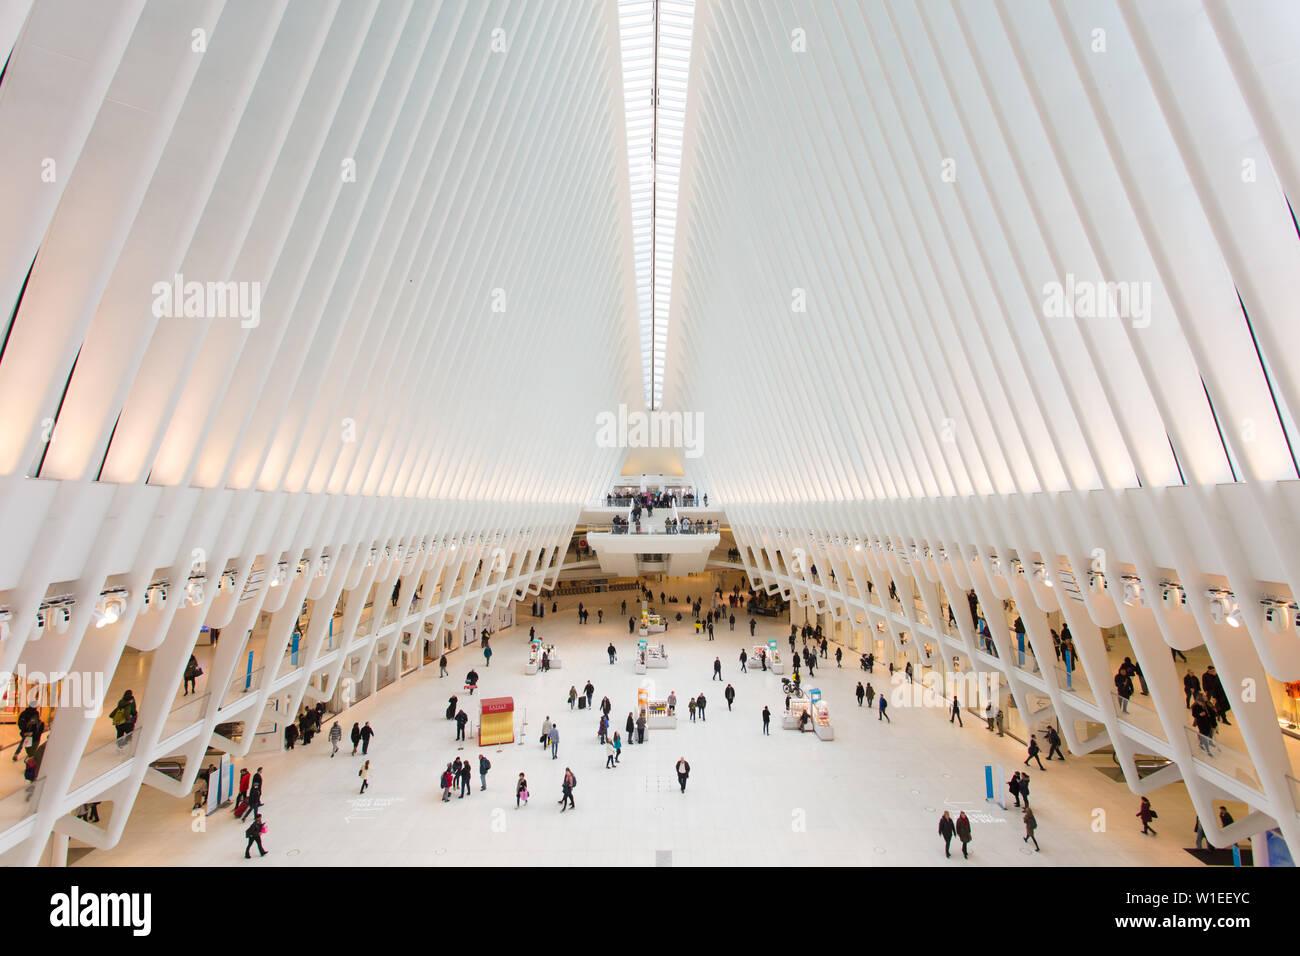 Oculus, World Trade Center Transportation Hub, Financial District, Manhattan, New York City, New York, États-Unis d'Amérique, Amérique du Nord Banque D'Images